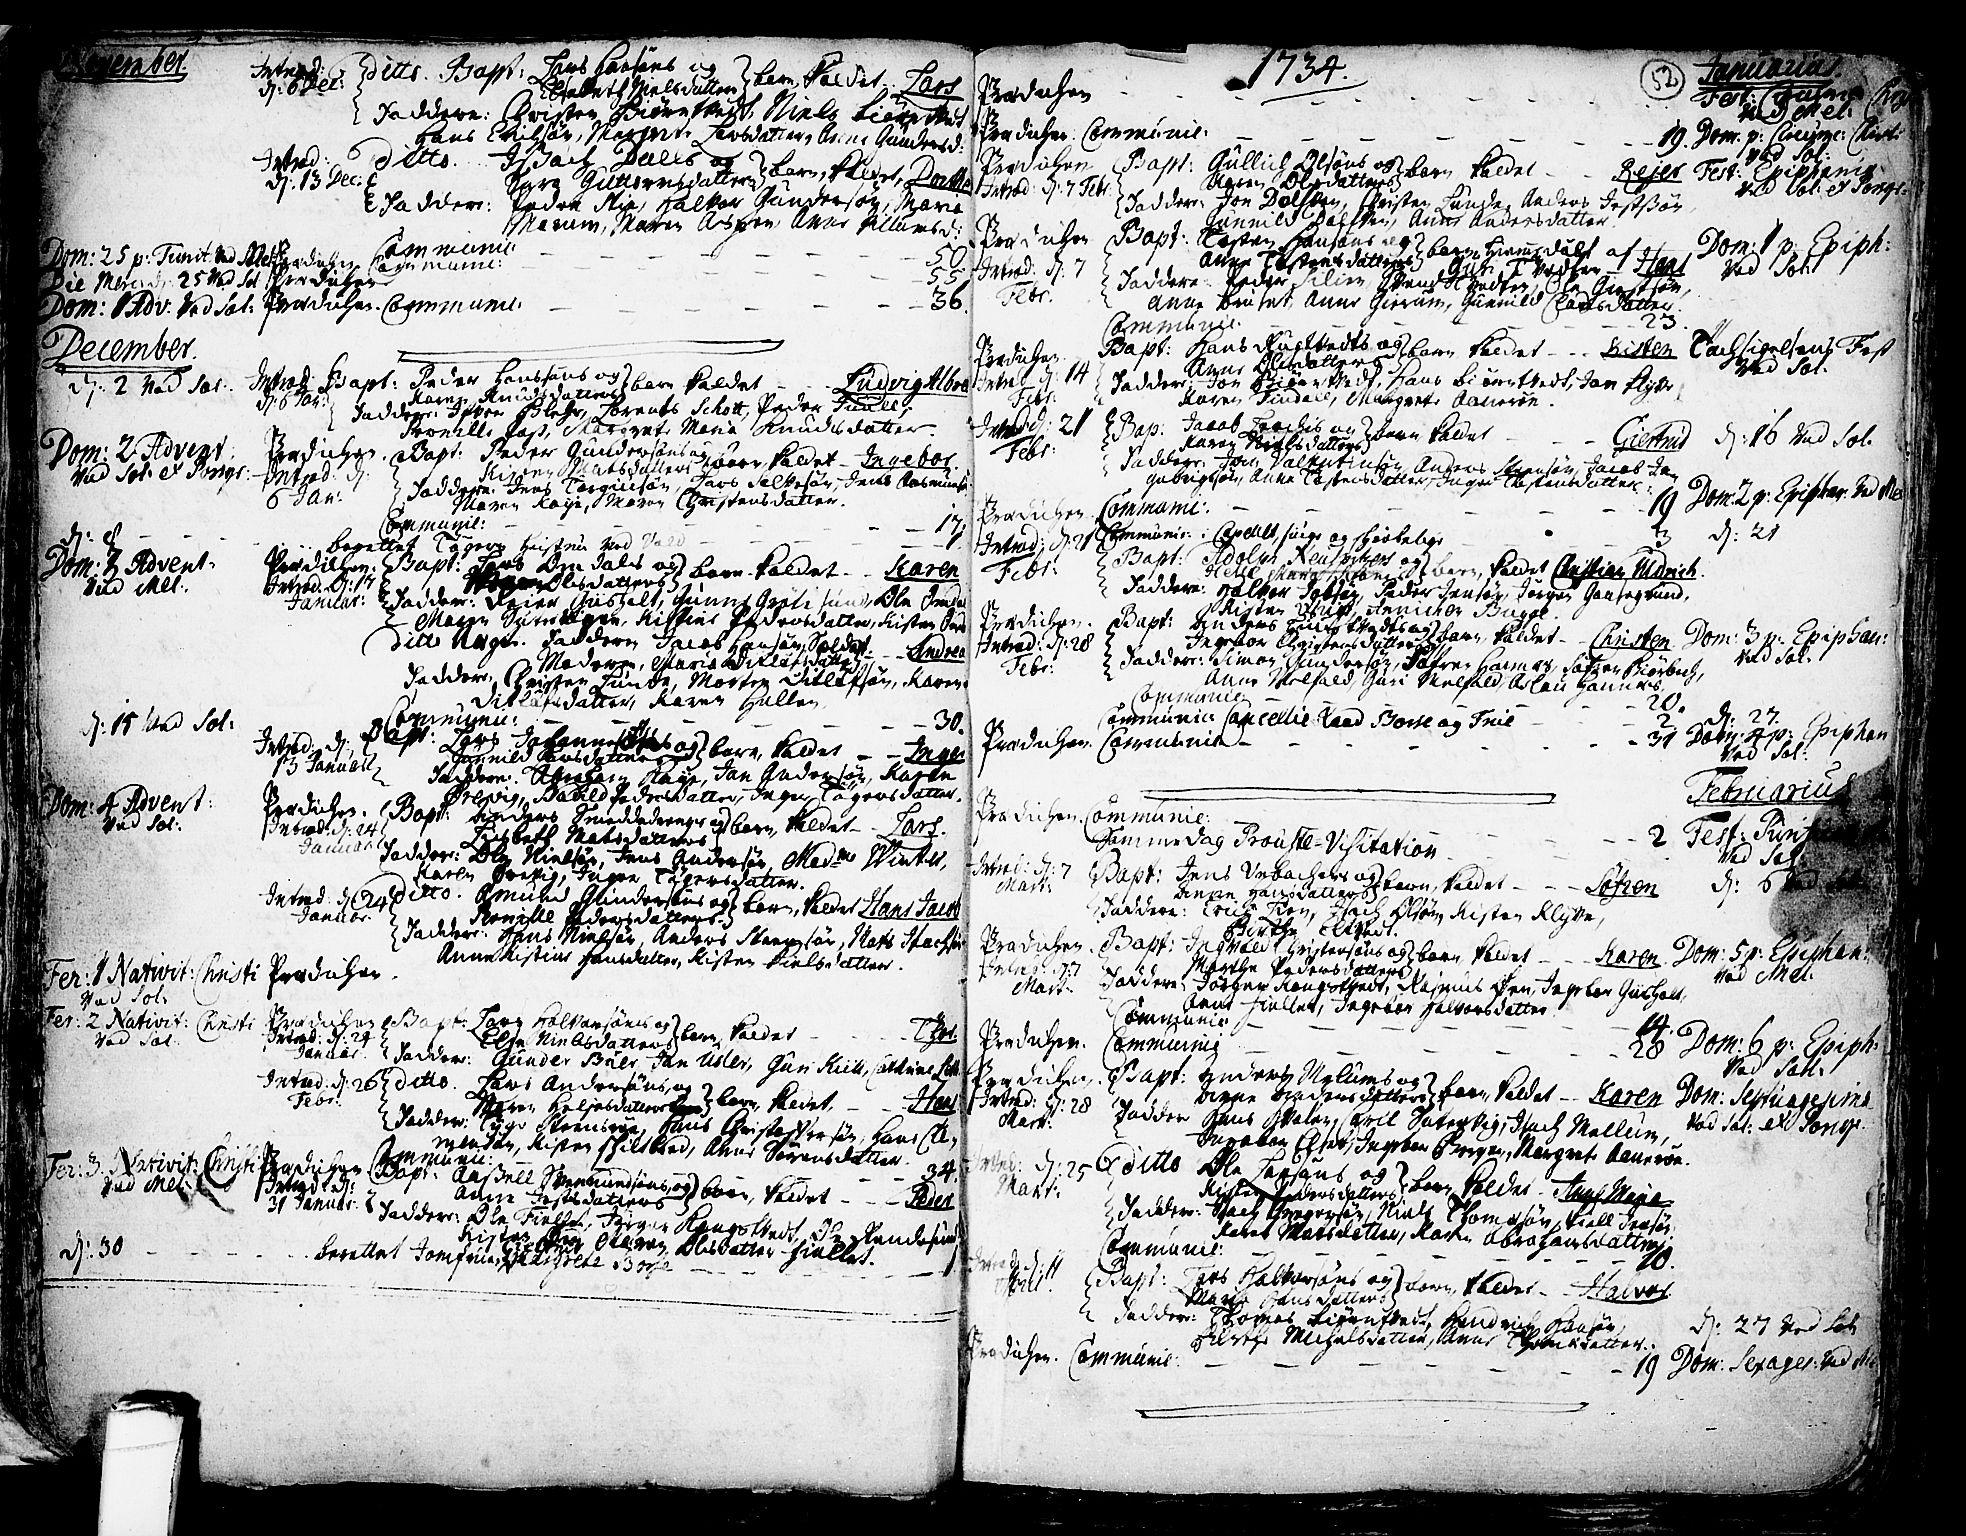 SAKO, Solum kirkebøker, F/Fa/L0002: Ministerialbok nr. I 2, 1713-1761, s. 52